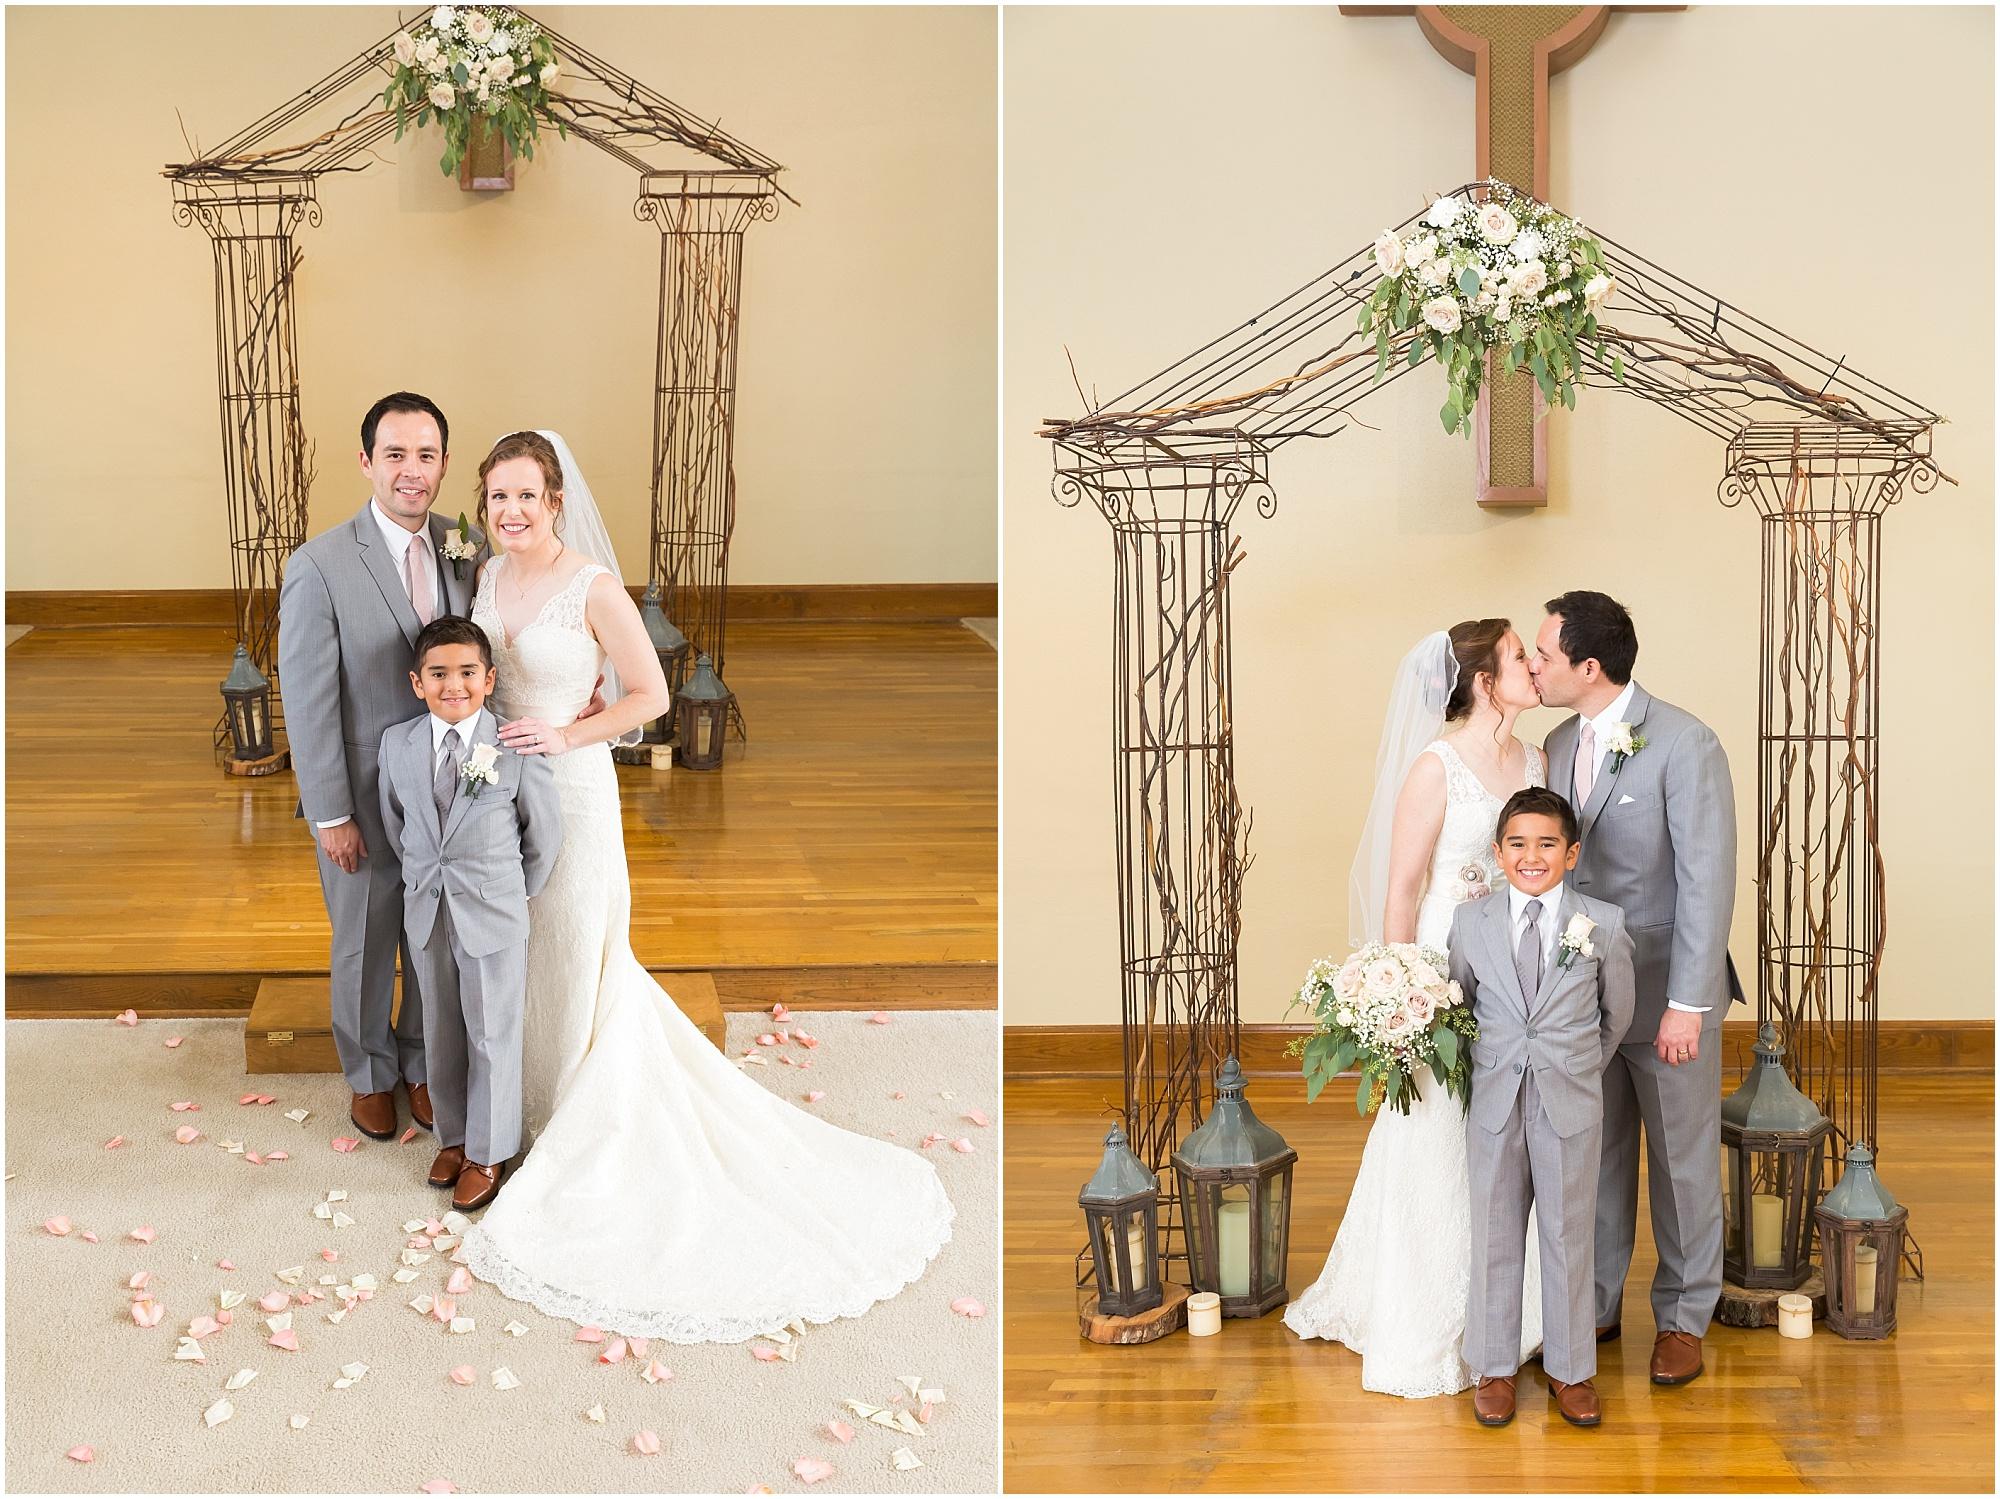 Downtown-Waco-Fall-Wedding_0023.jpg